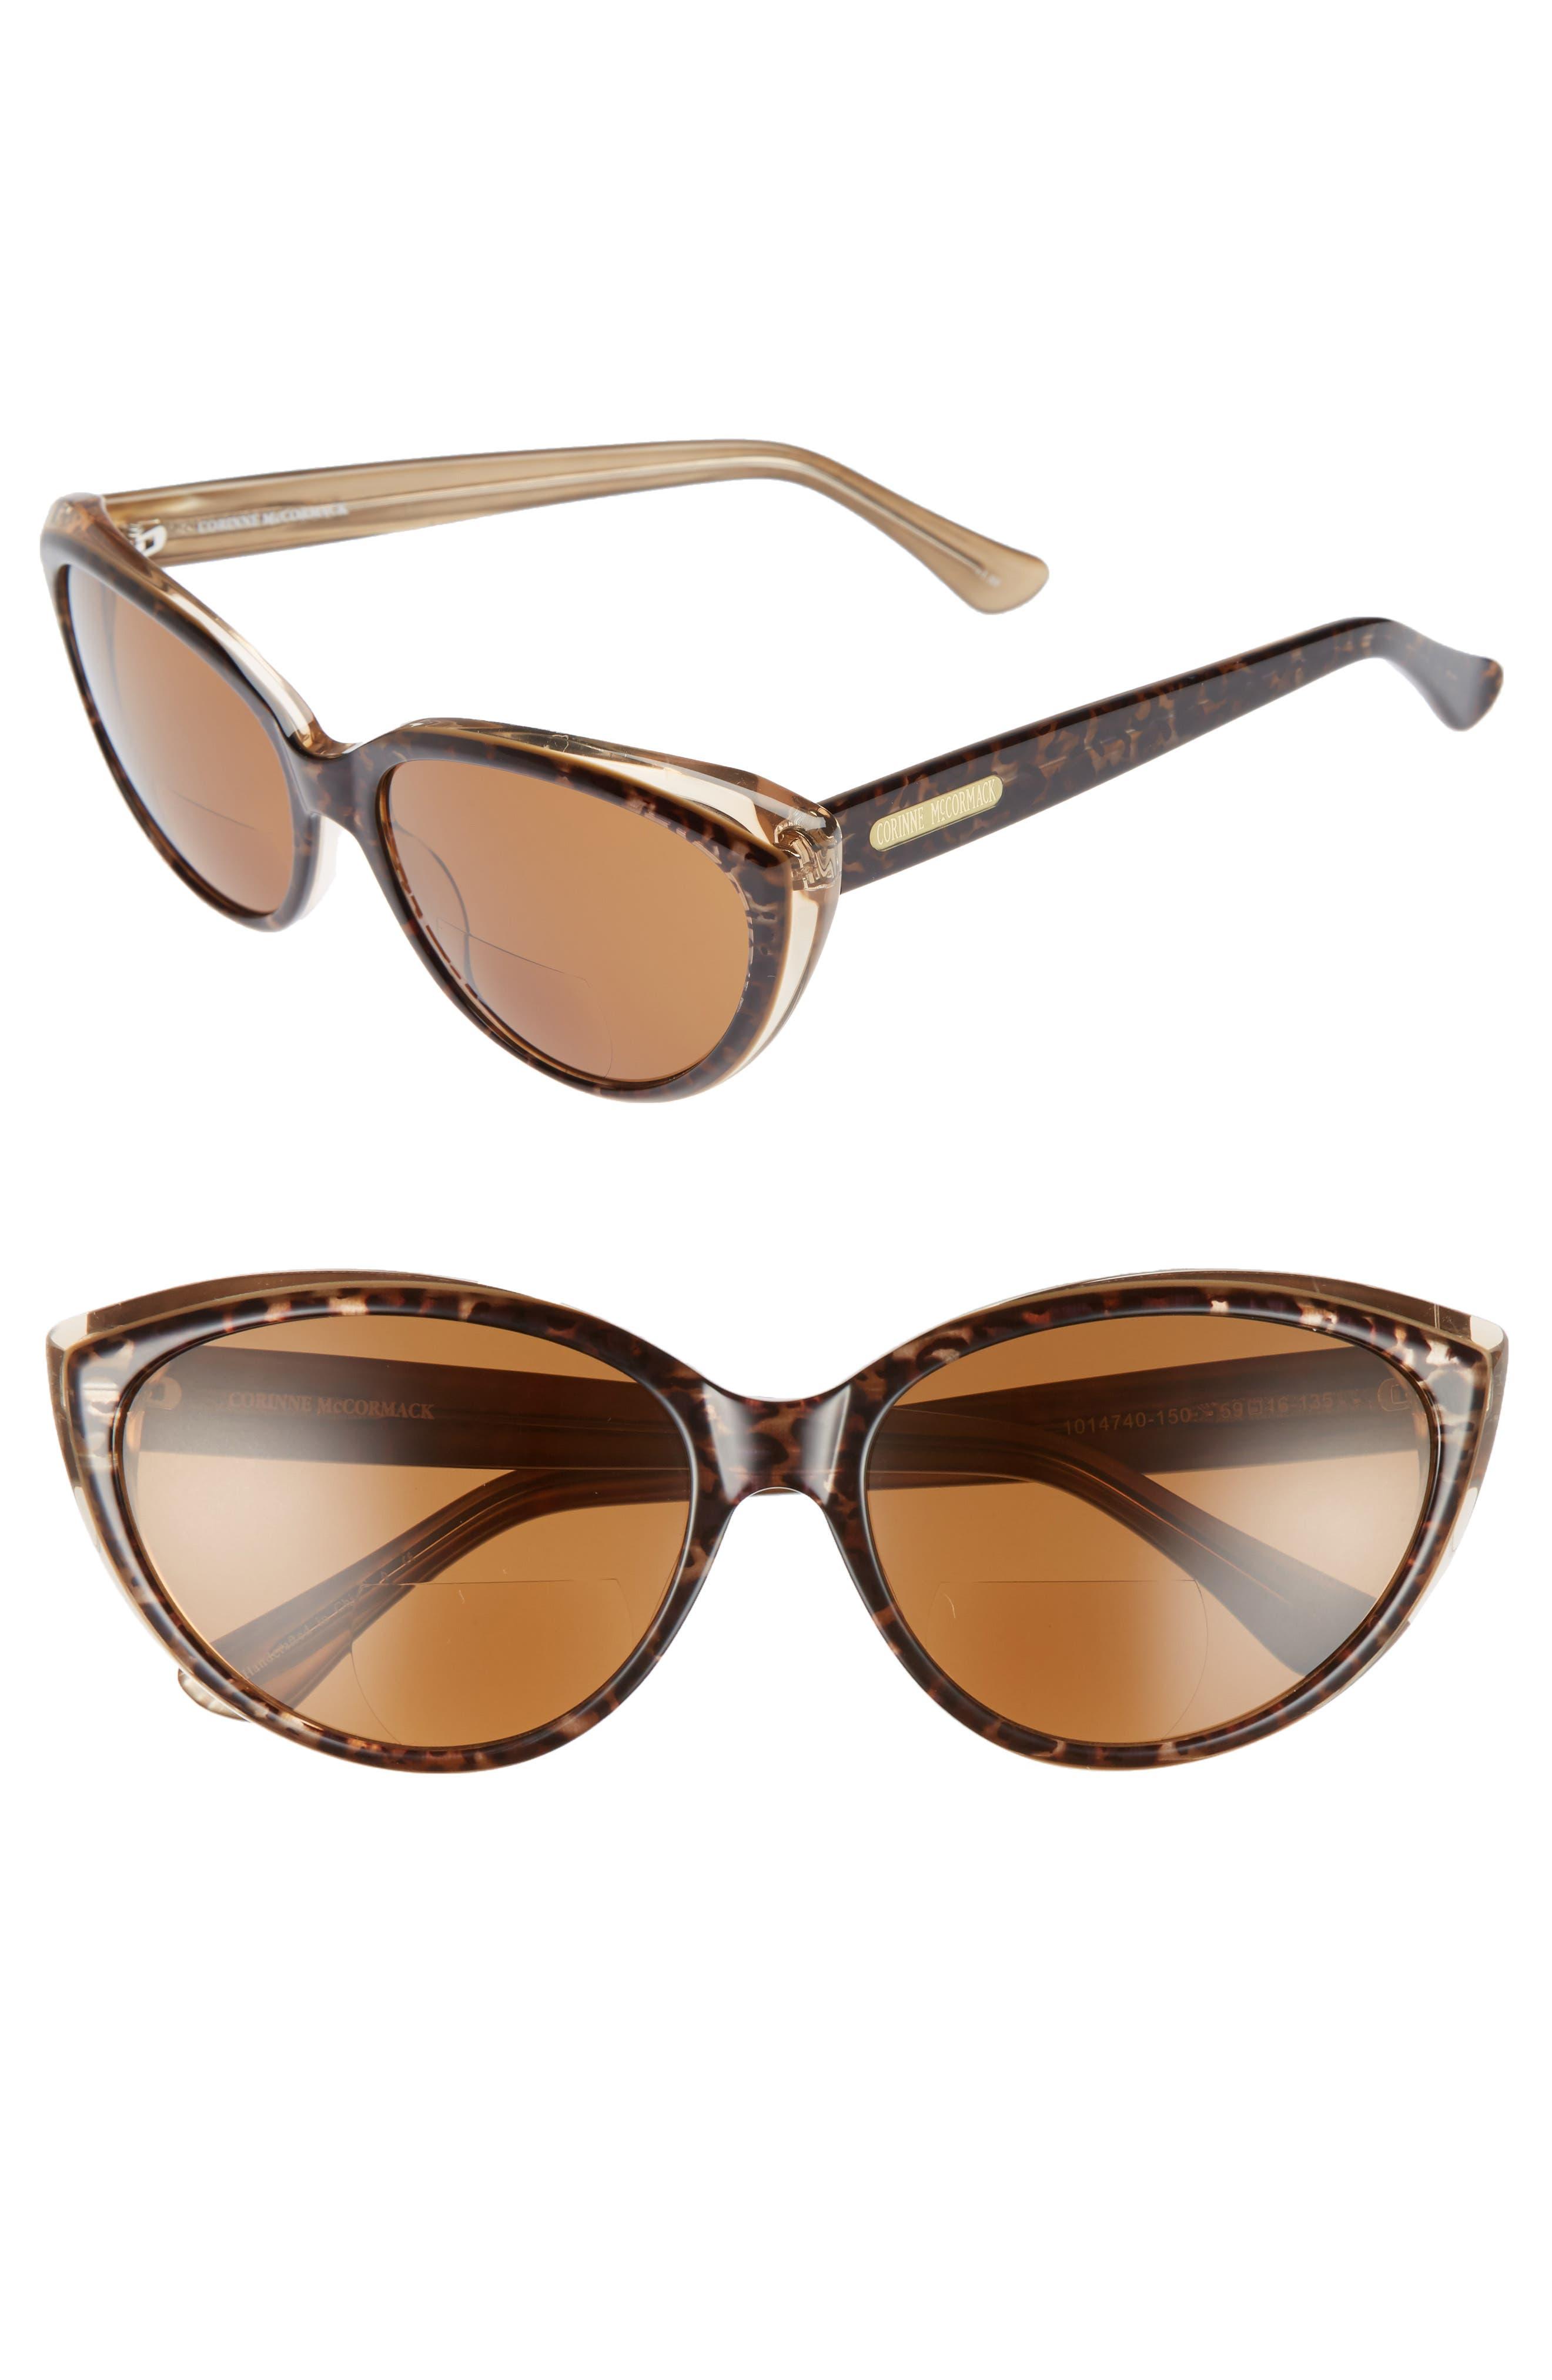 Corrine McCormack Anita 59mm Reading Sunglasses,                         Main,                         color, DARK LEOPARD